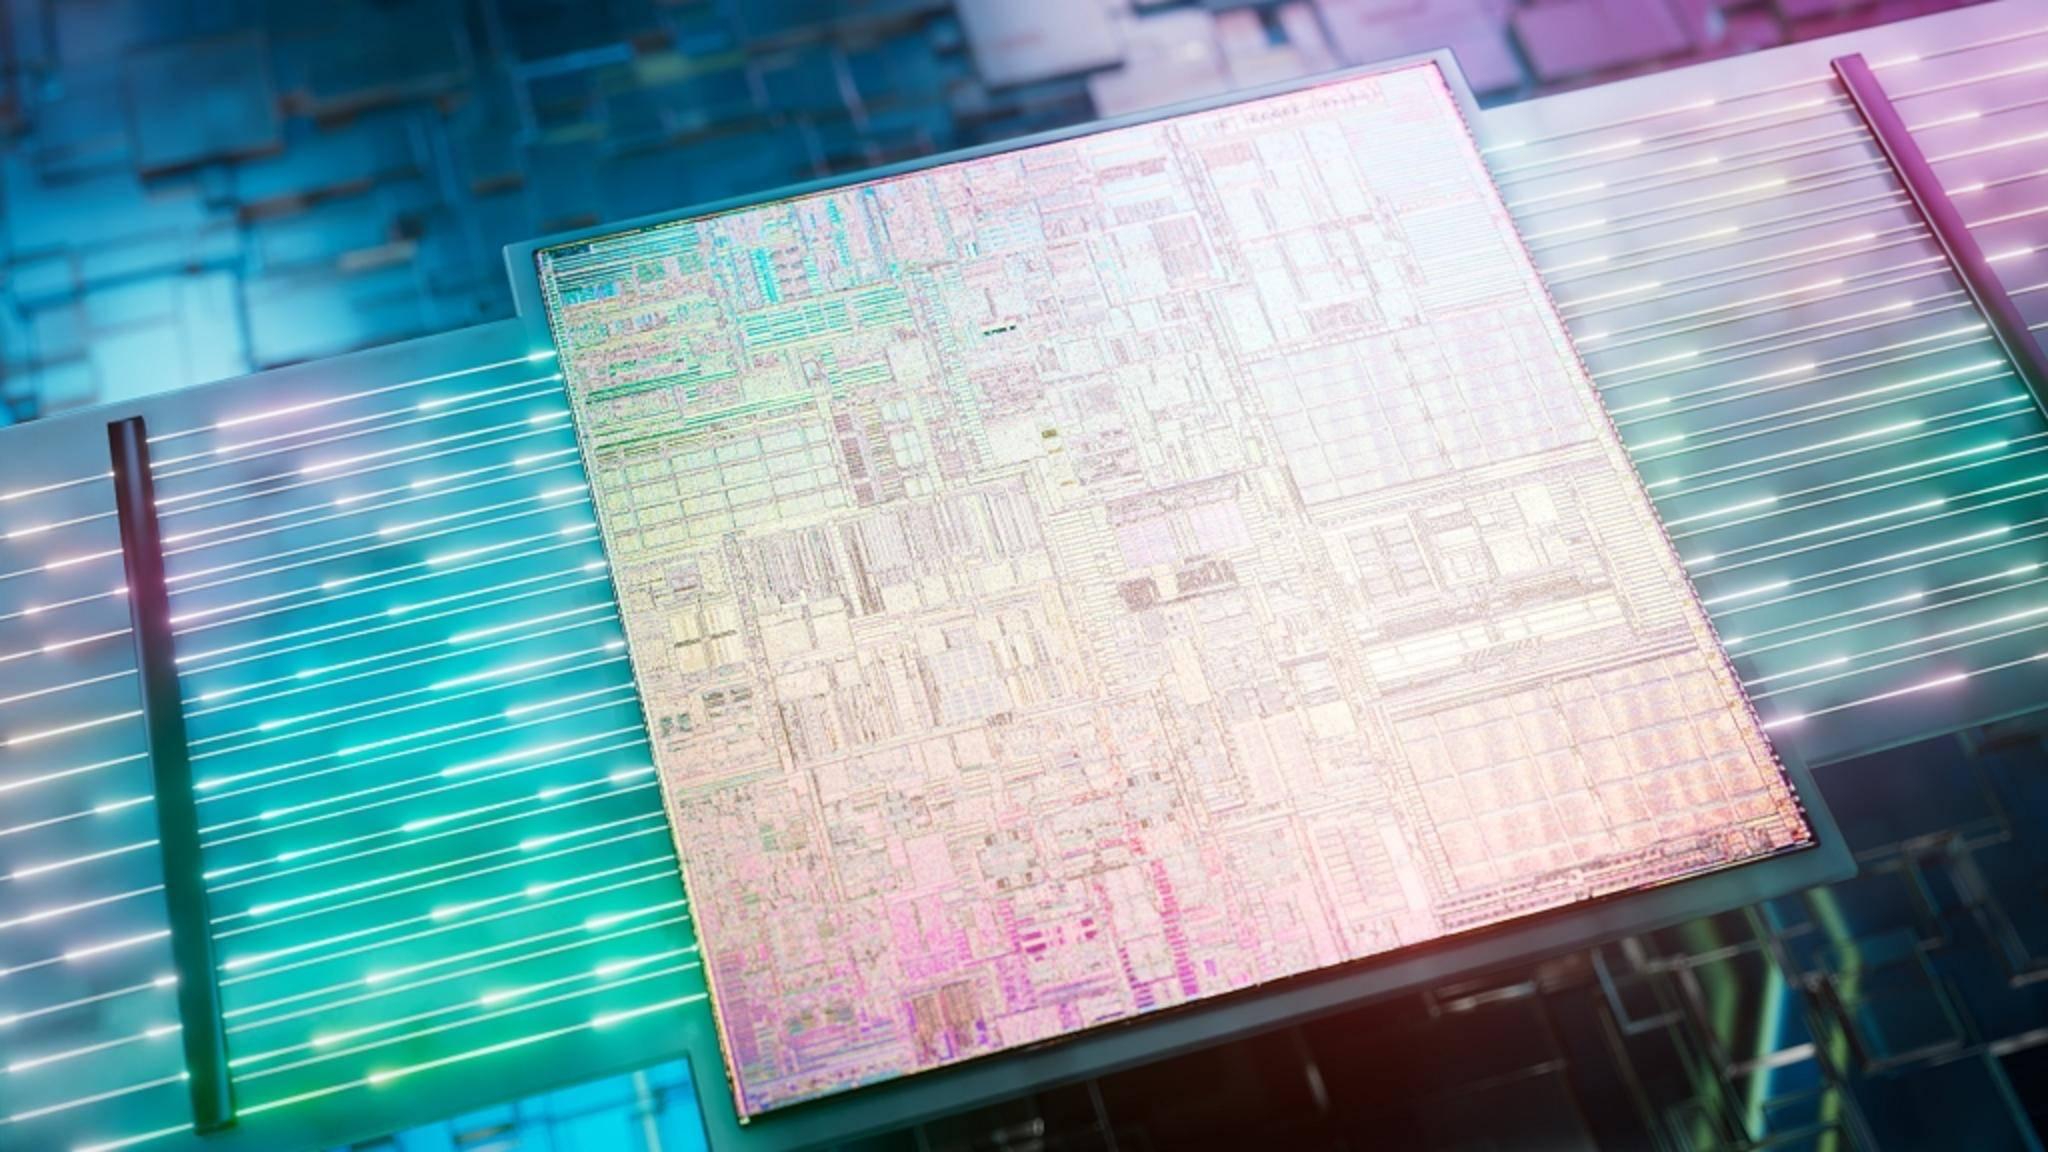 Intel-Prozessor-optische-Schnittstelle